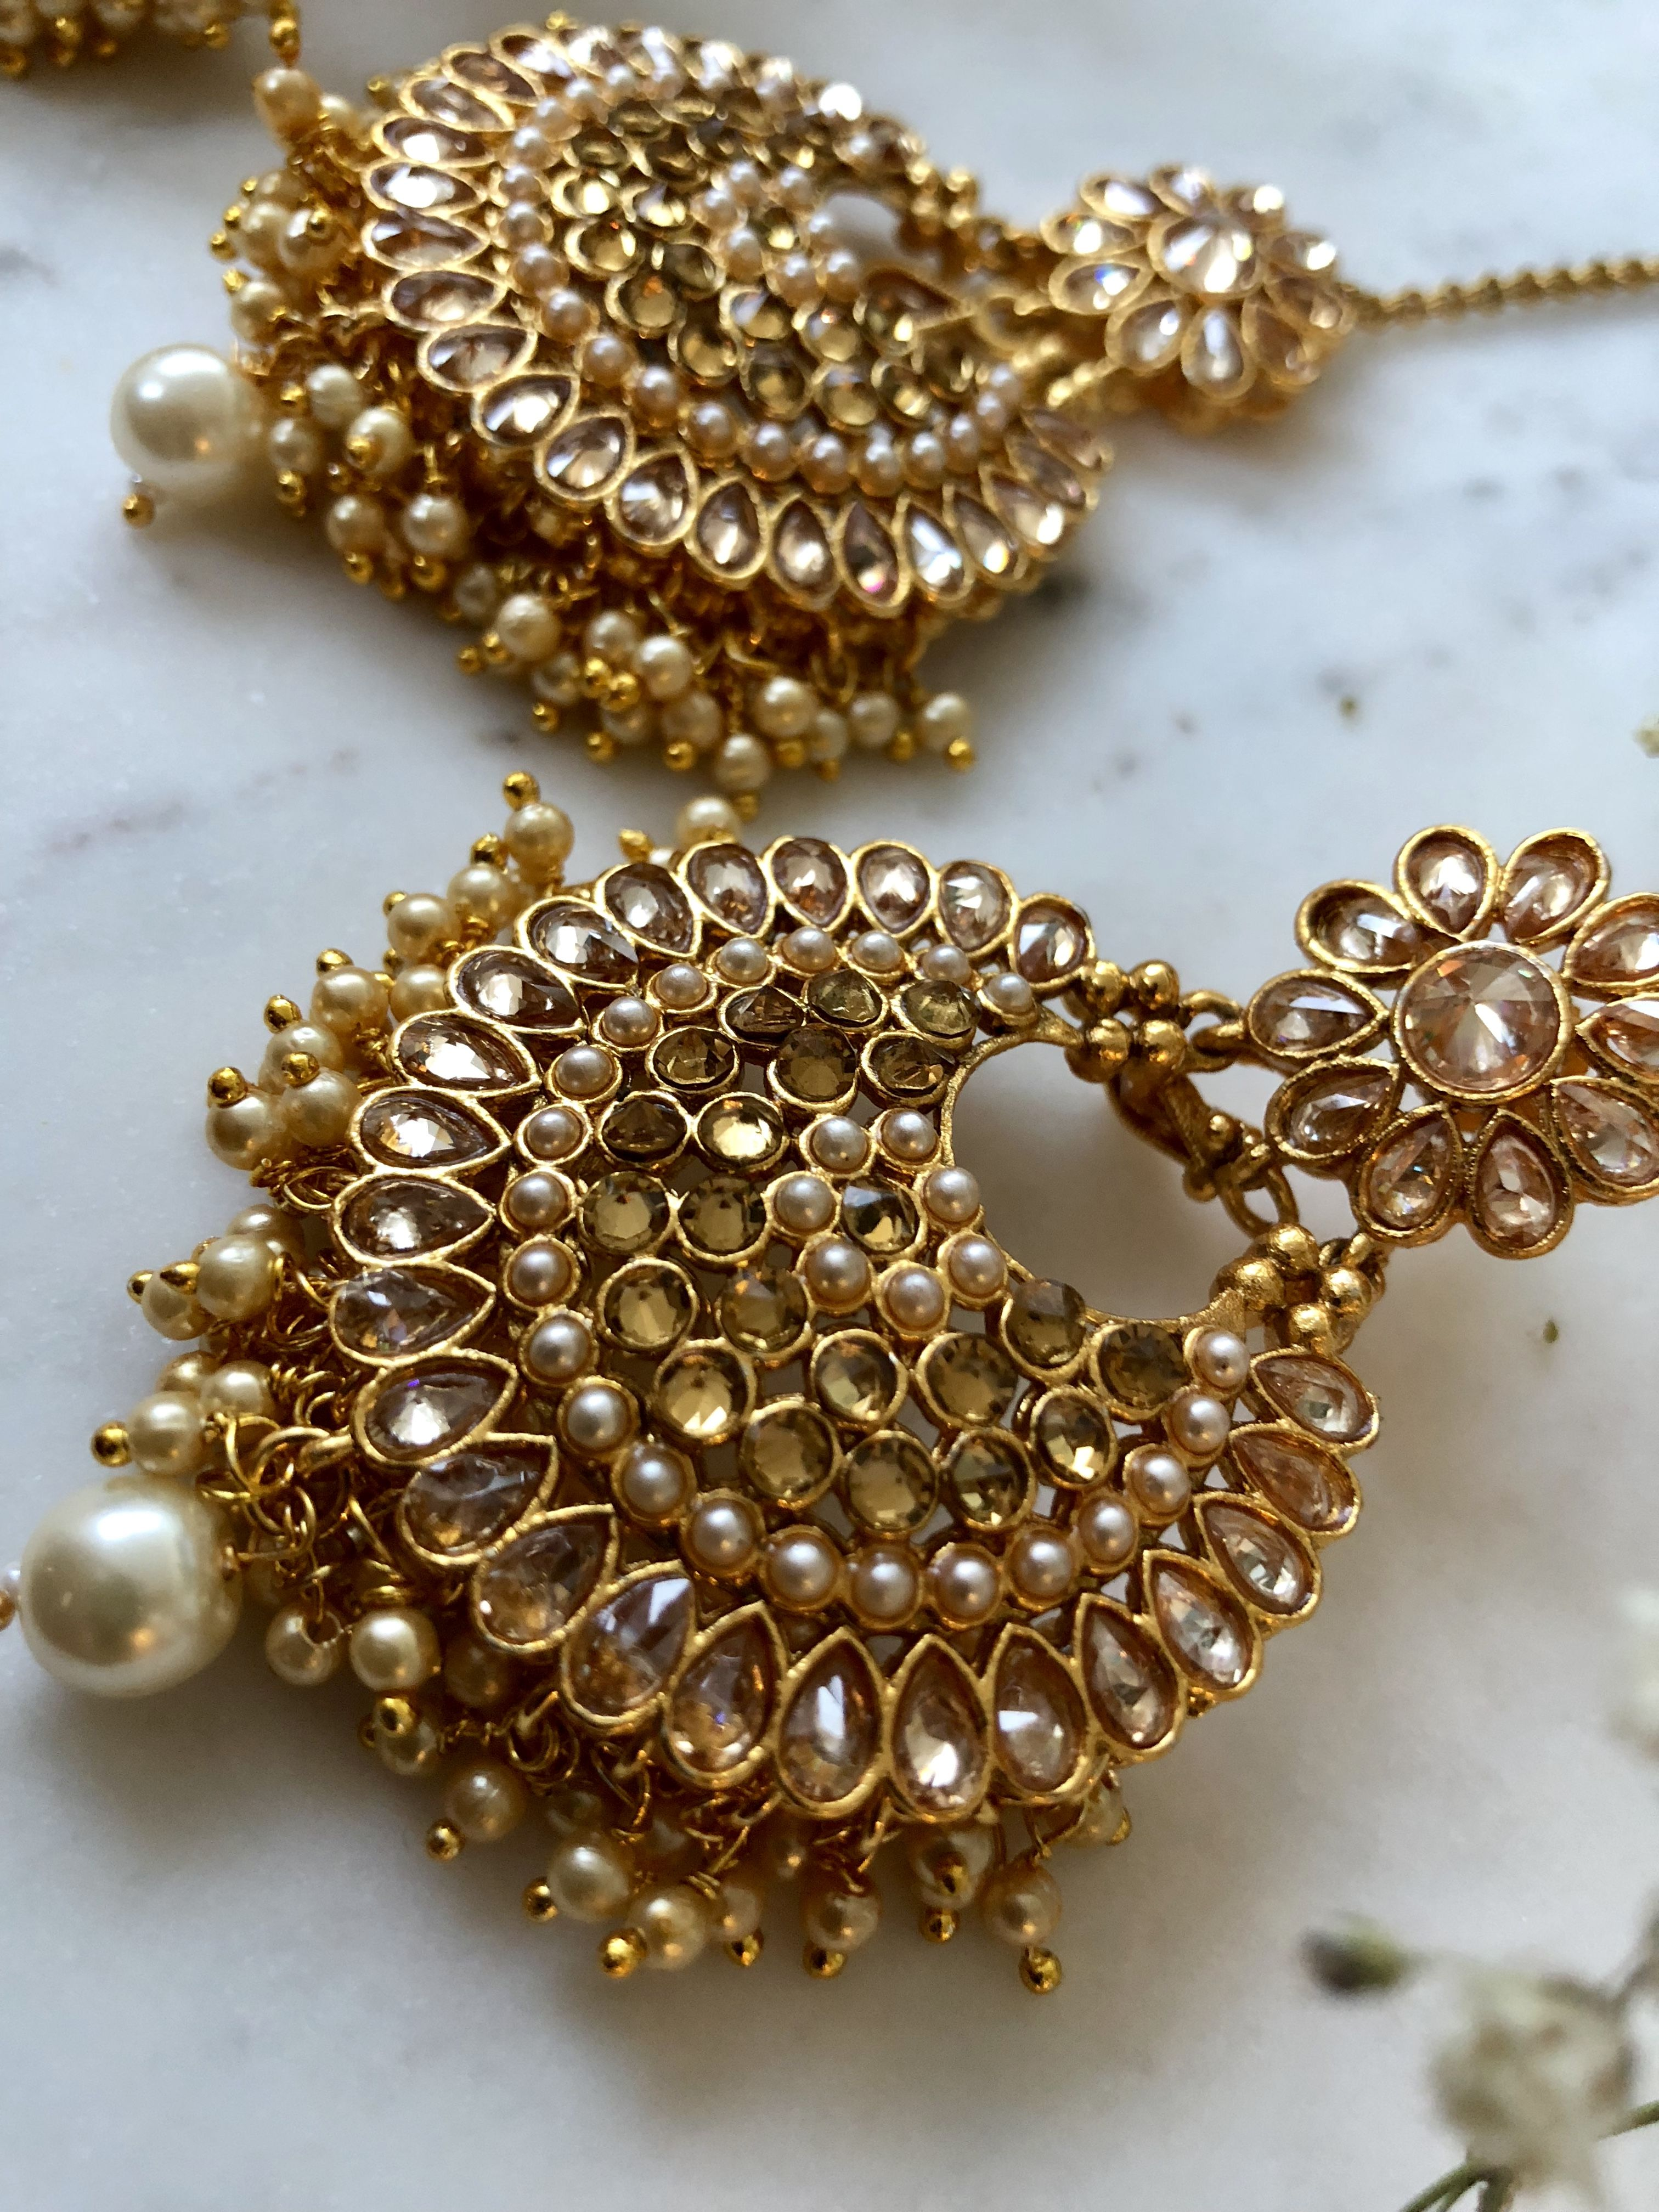 Obliging Kundan Necklace With Earrings Set Blue White Kundan Wedding Jewelry Set Usa Uk 100% Original Jewelry Sets